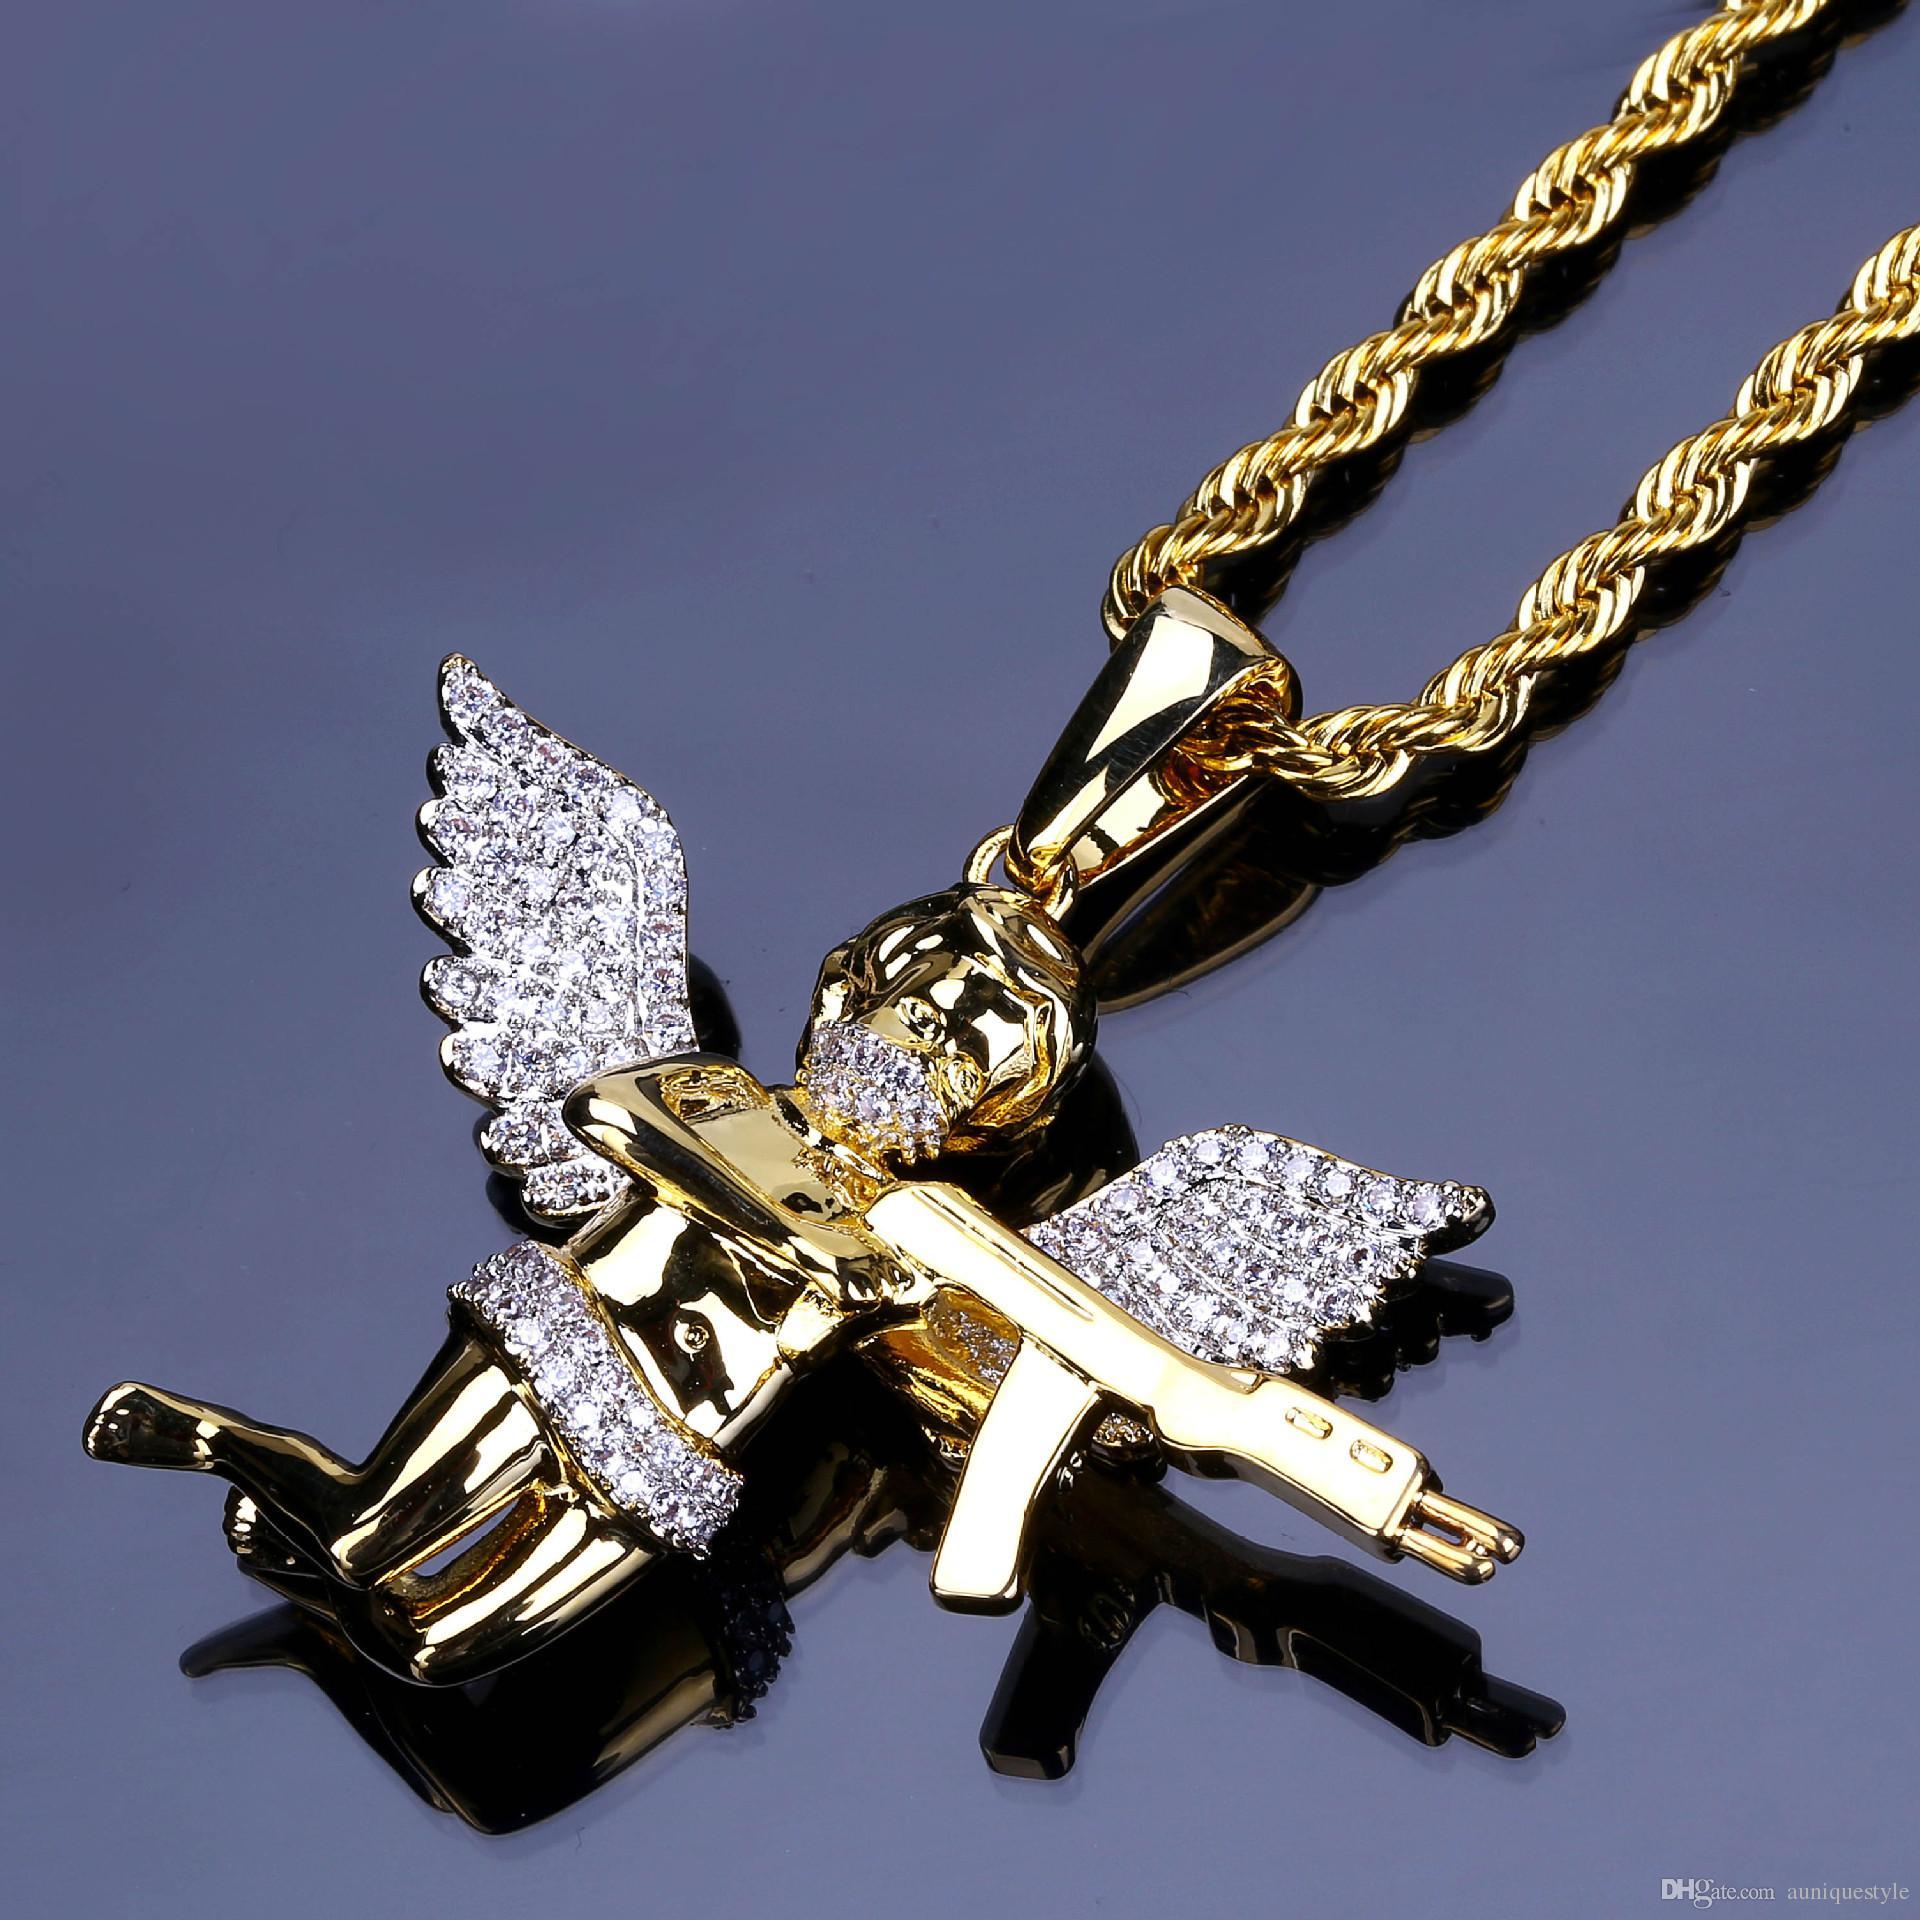 7da2197282df Compre Hombres Collares De Diamantes De Imitación Llenos ...